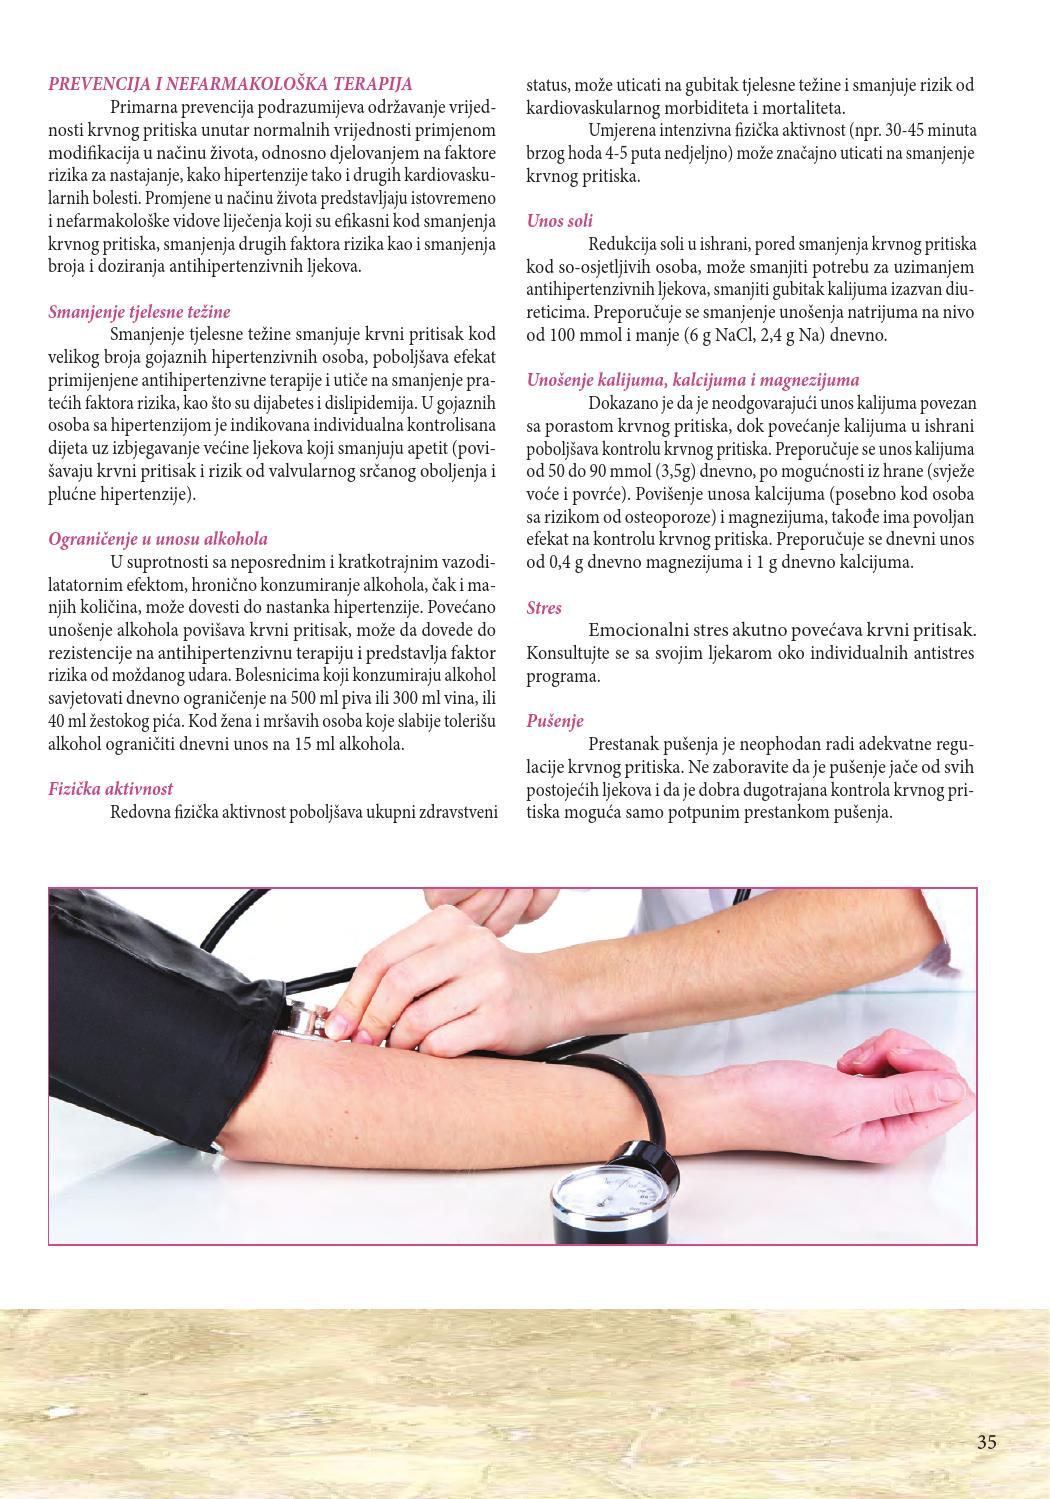 rizik hipertenzija oboljenje